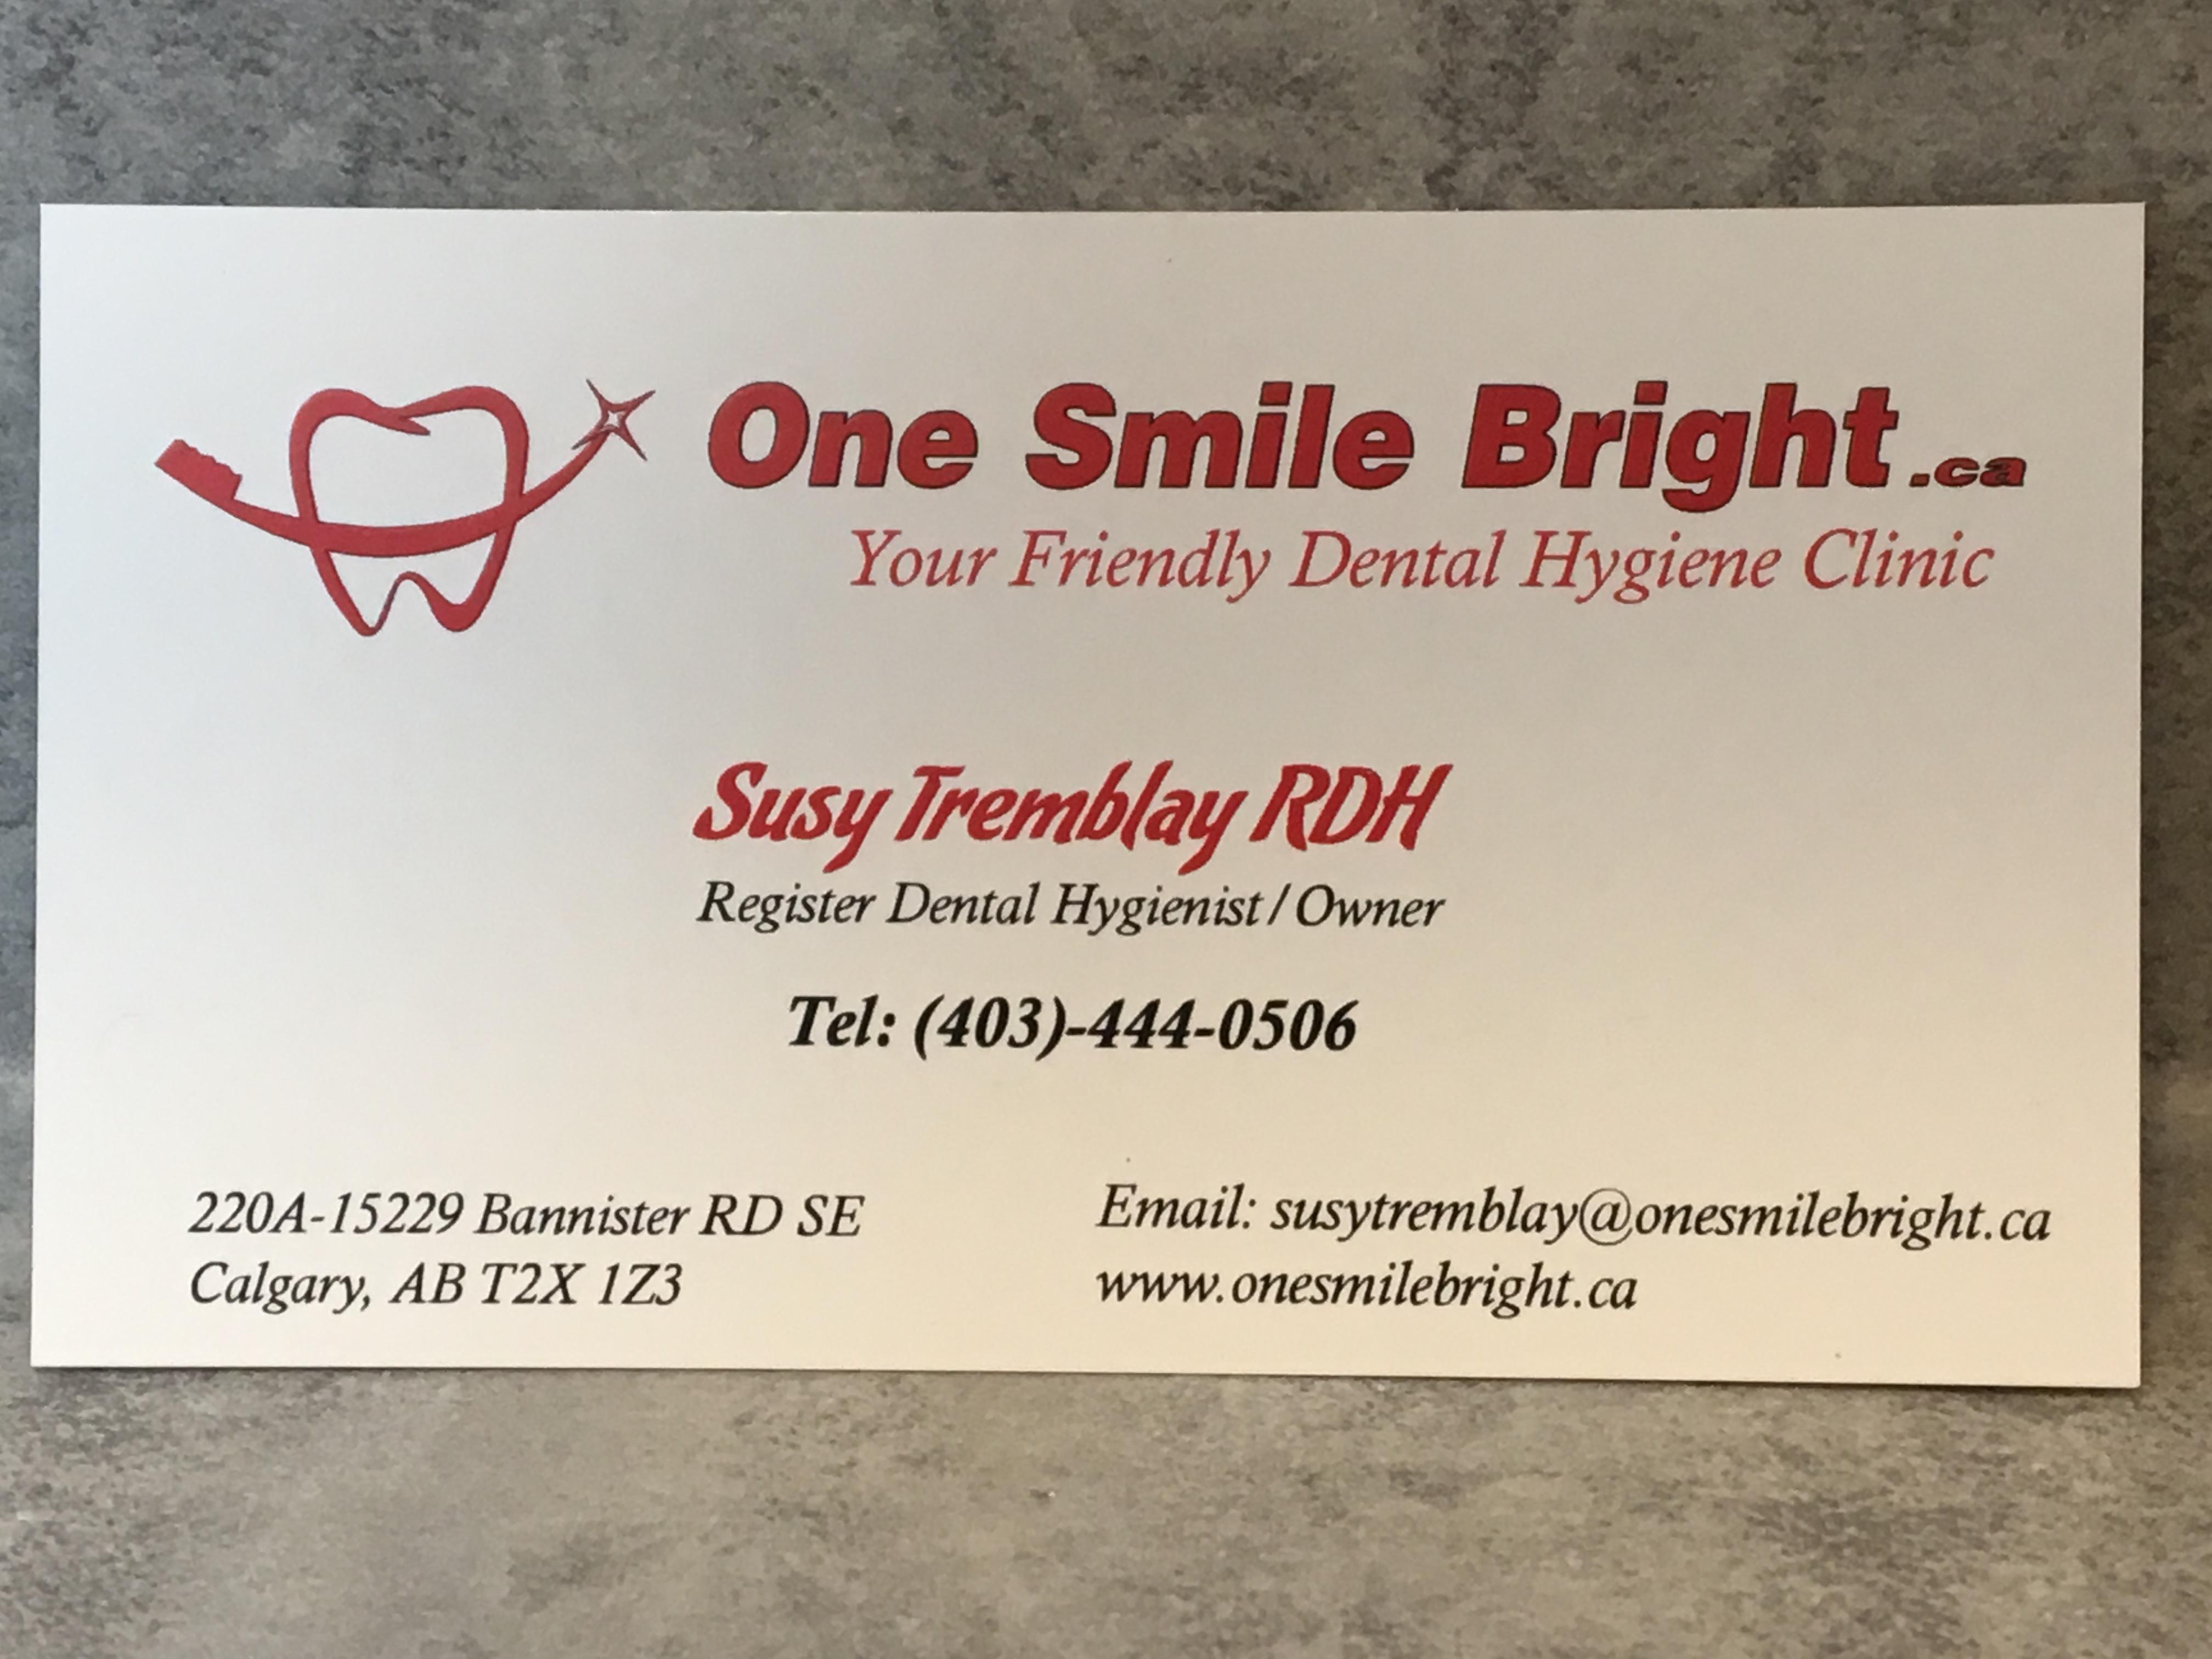 South Calgary Dental Hygiene Practice | One Smile Bright Photo Gallery